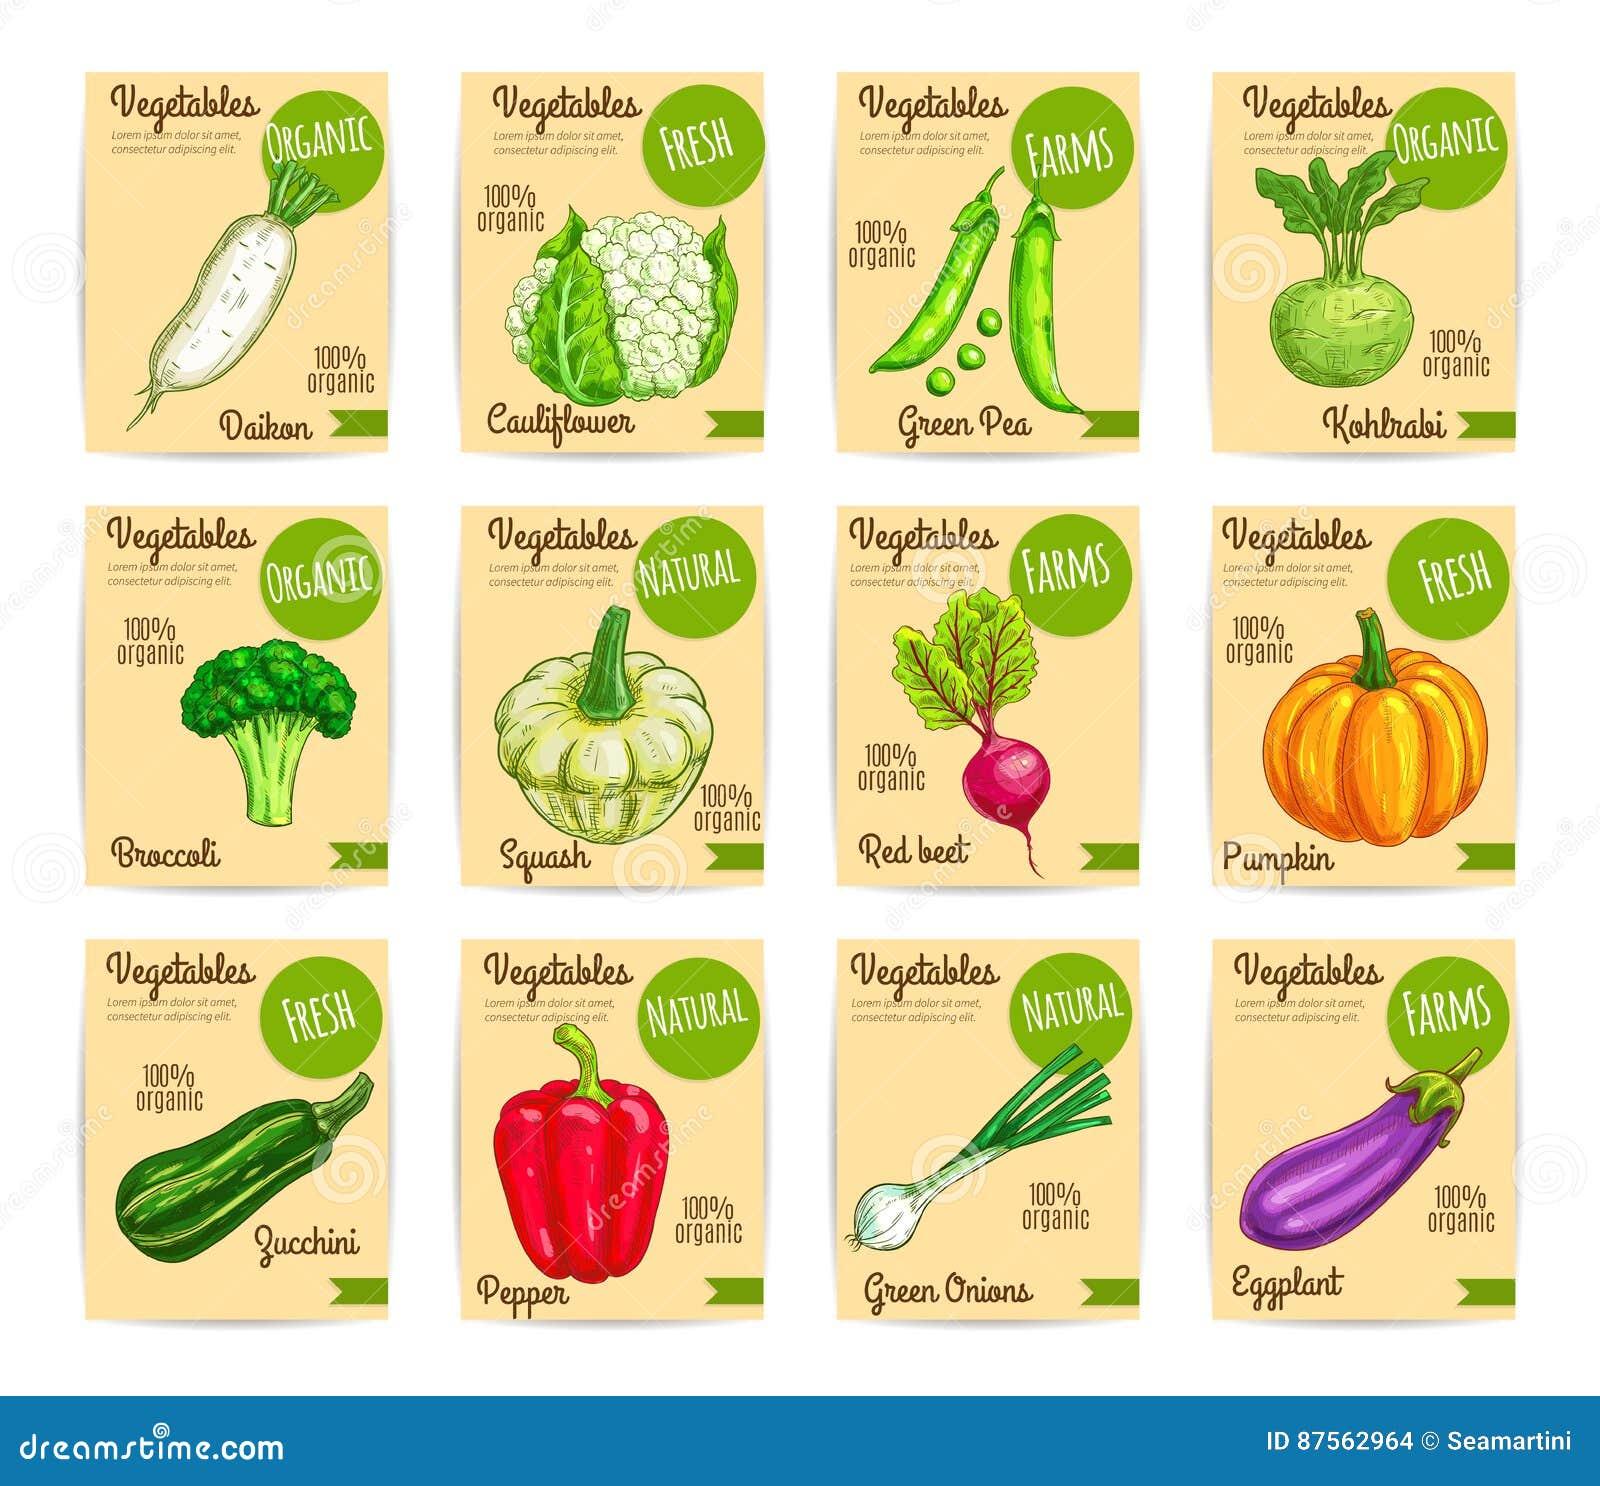 Videos By Tag: Vegetable